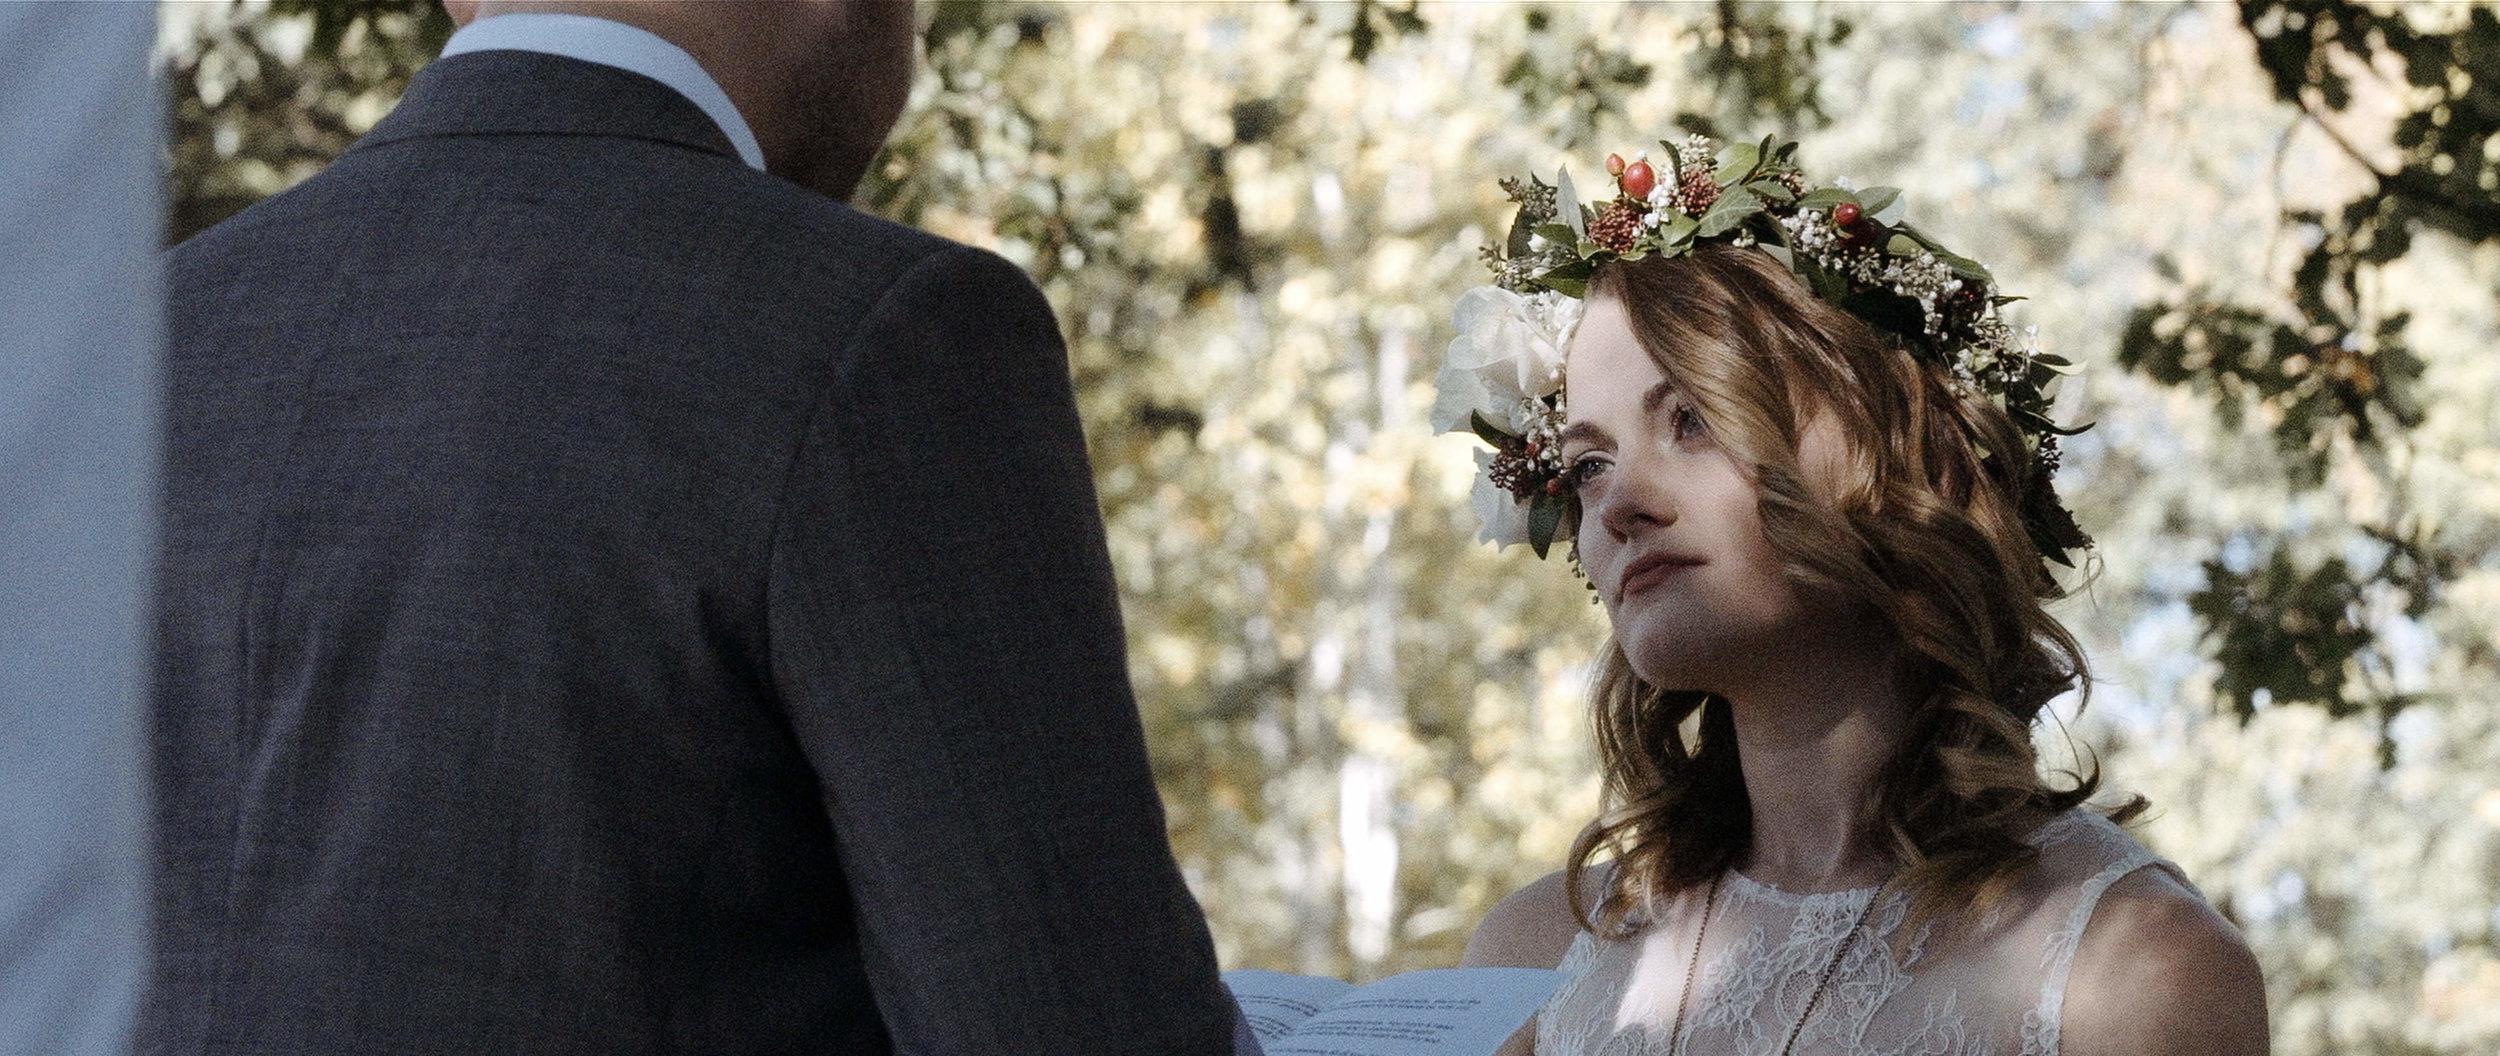 vancouver-wedding-videography165.jpg